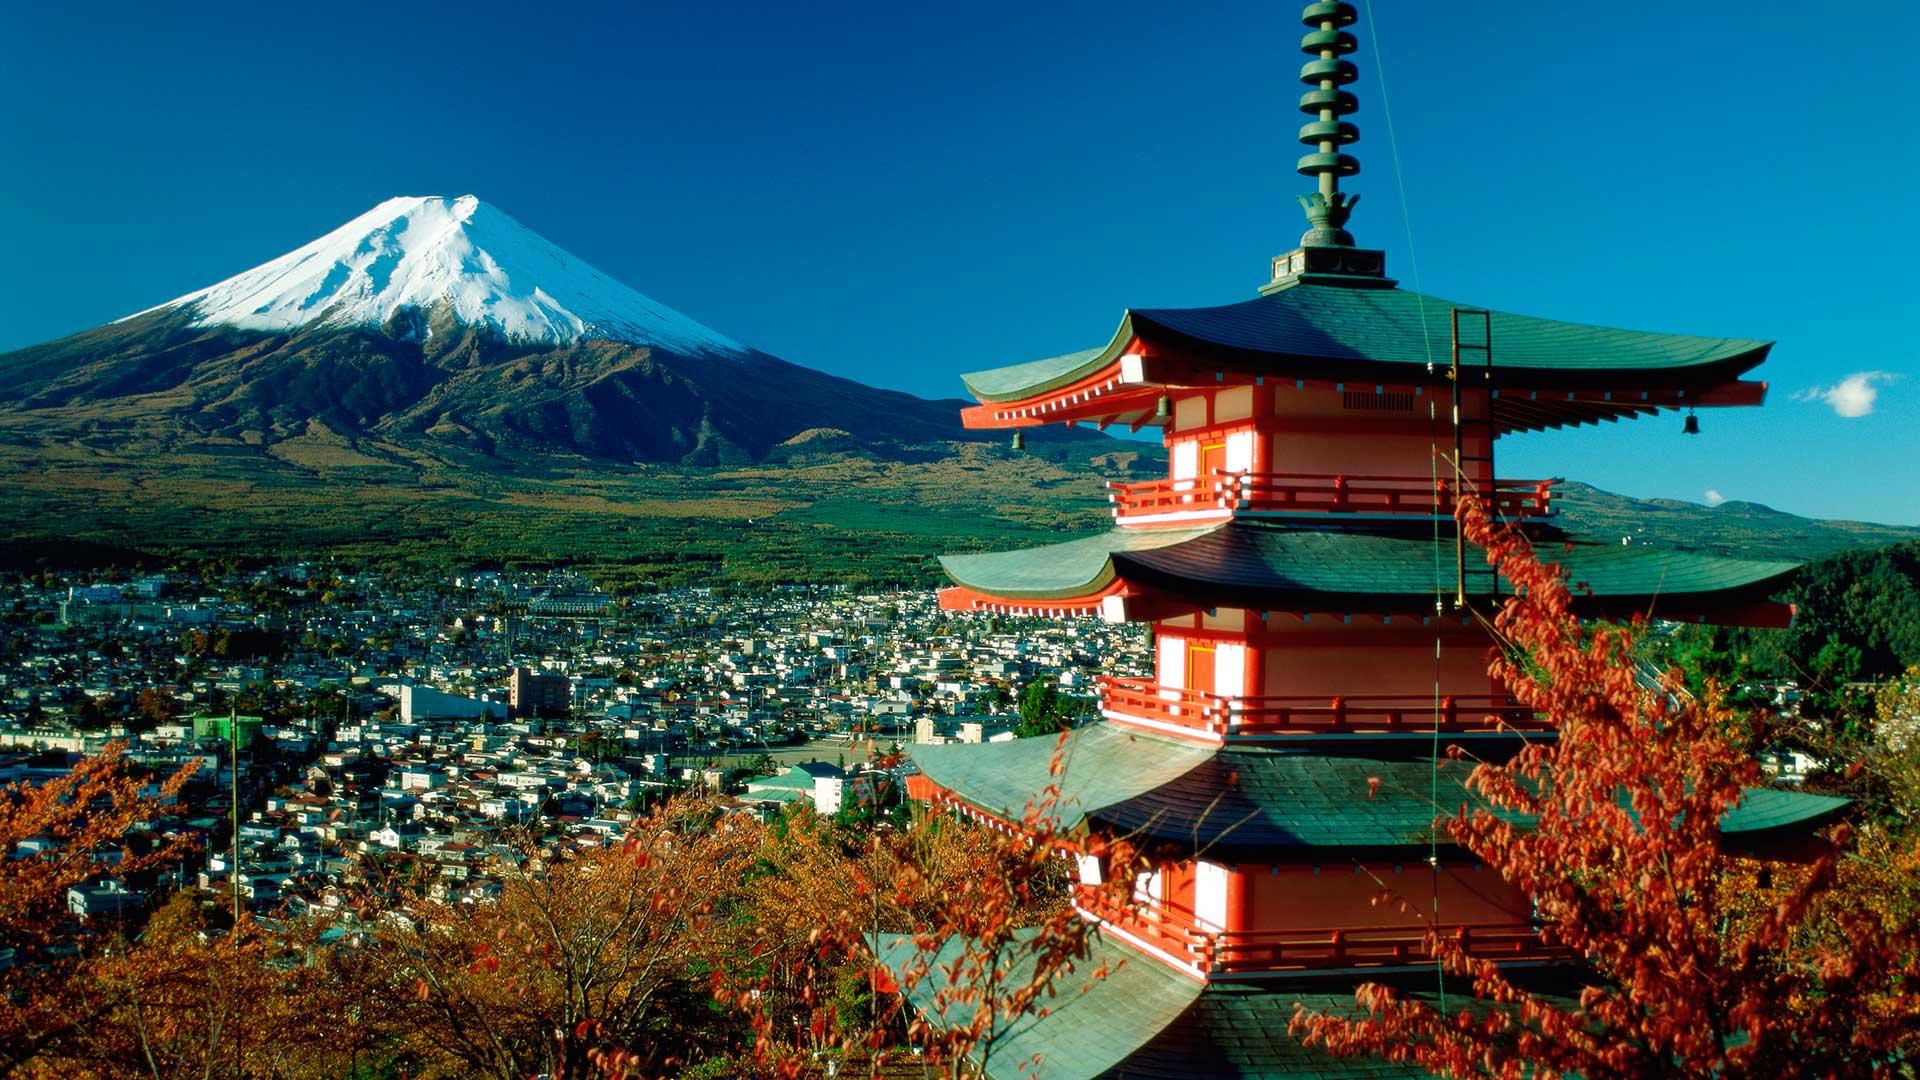 Mount Fuji & Pagoda, Hakone, Japan